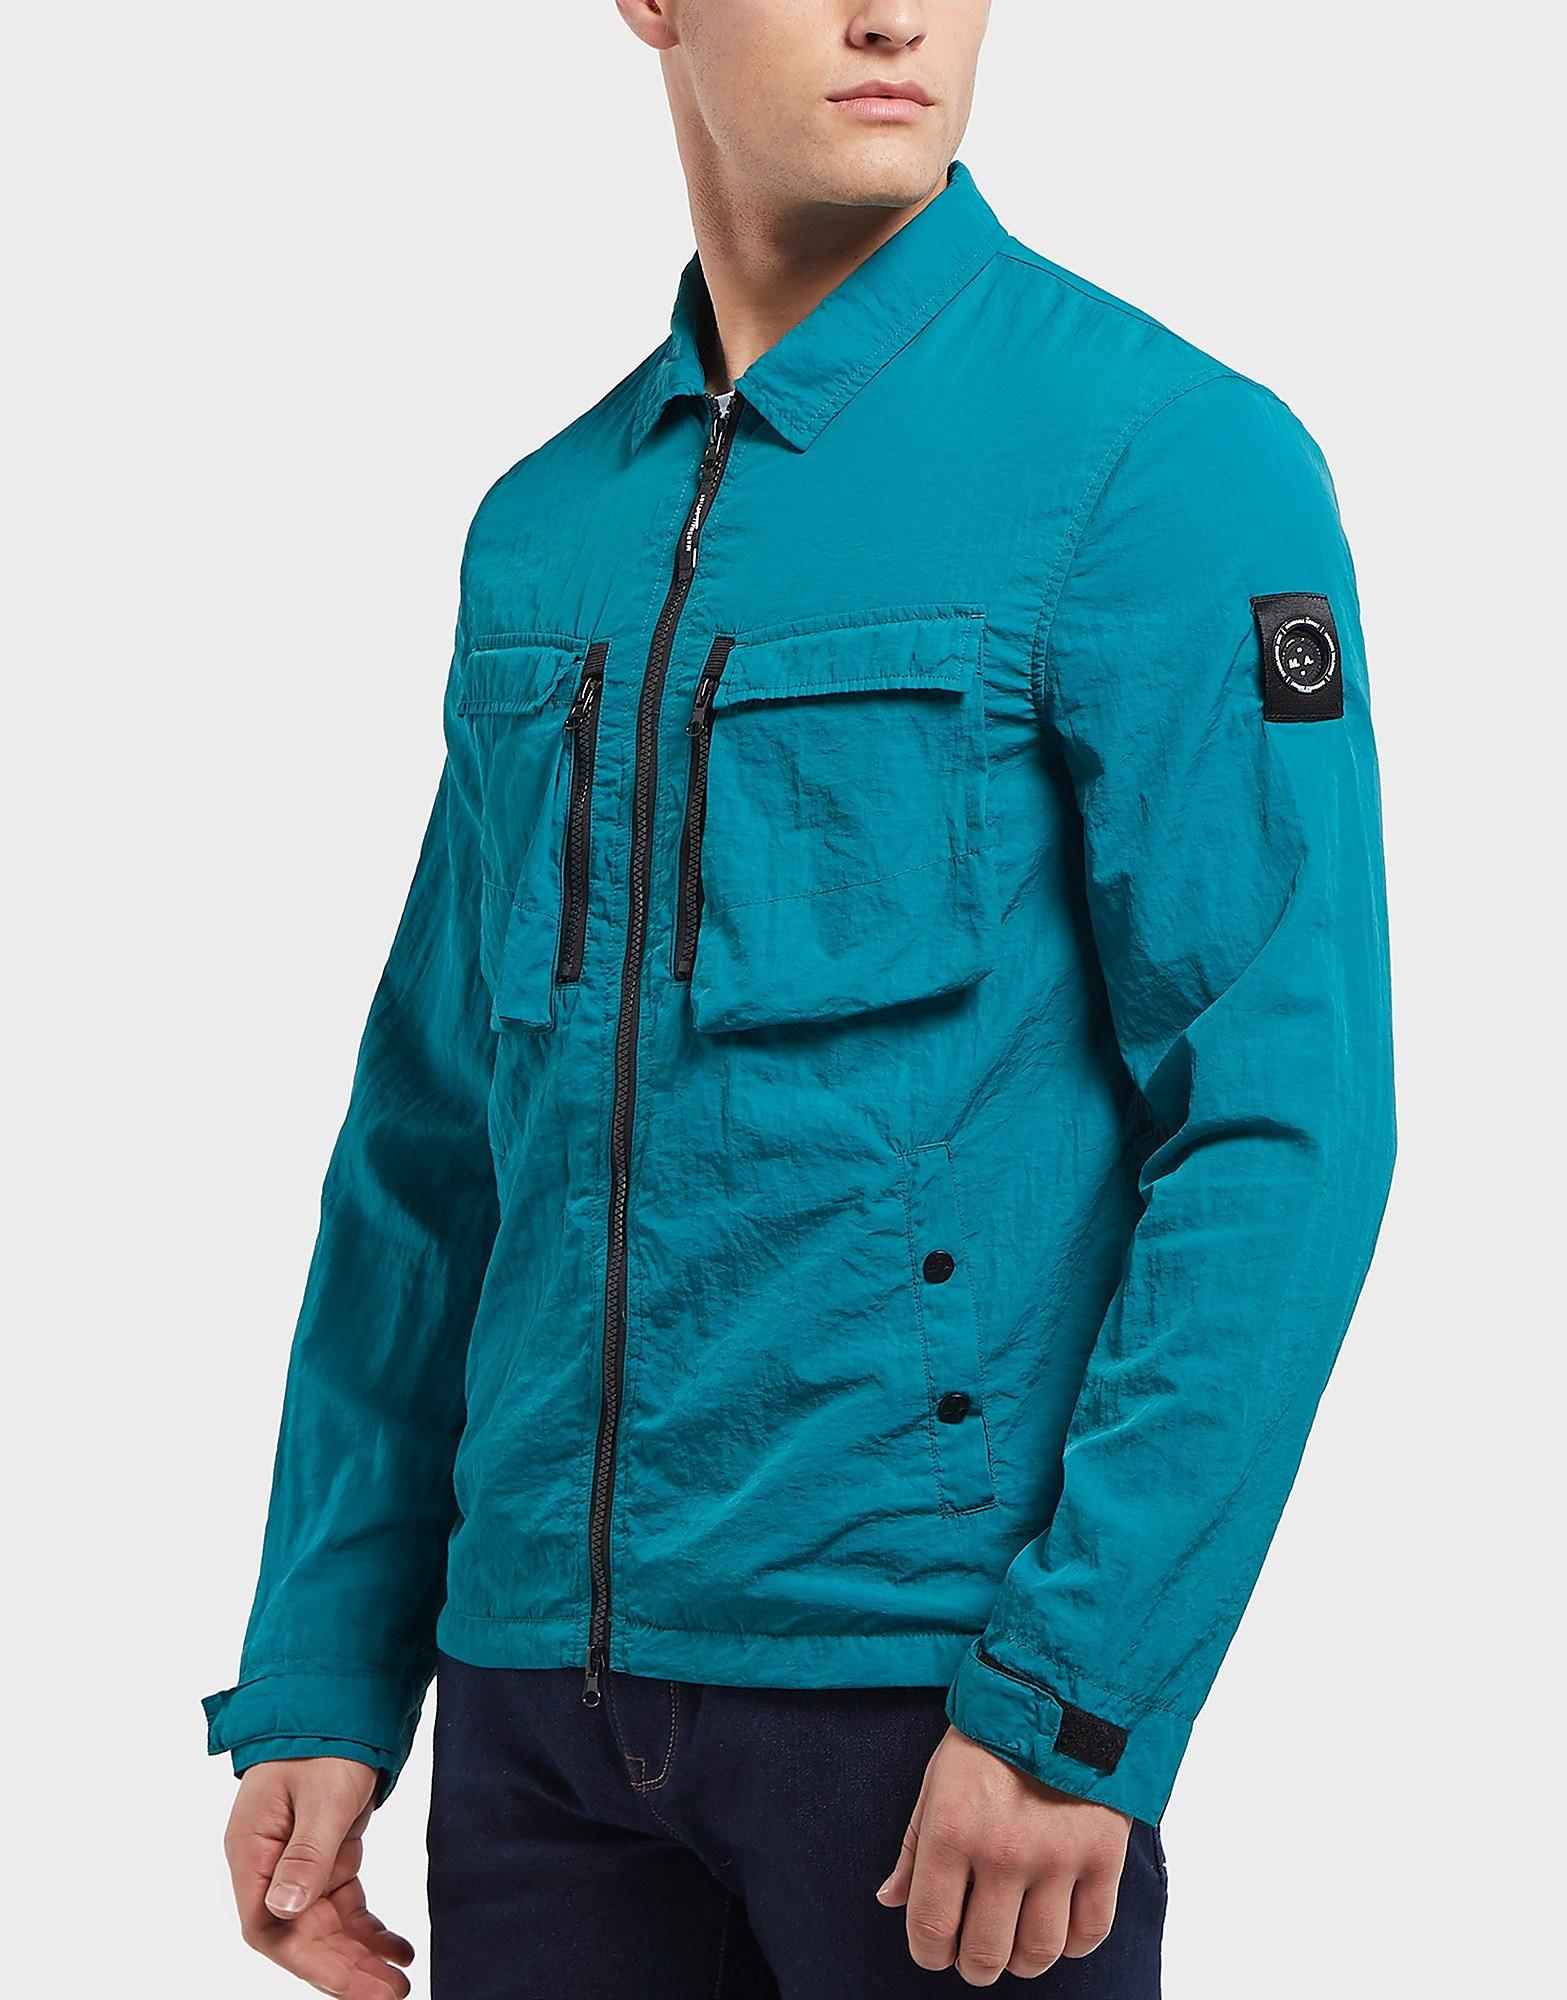 Marshall Artist Garment Dyed Full Zip Overshirt